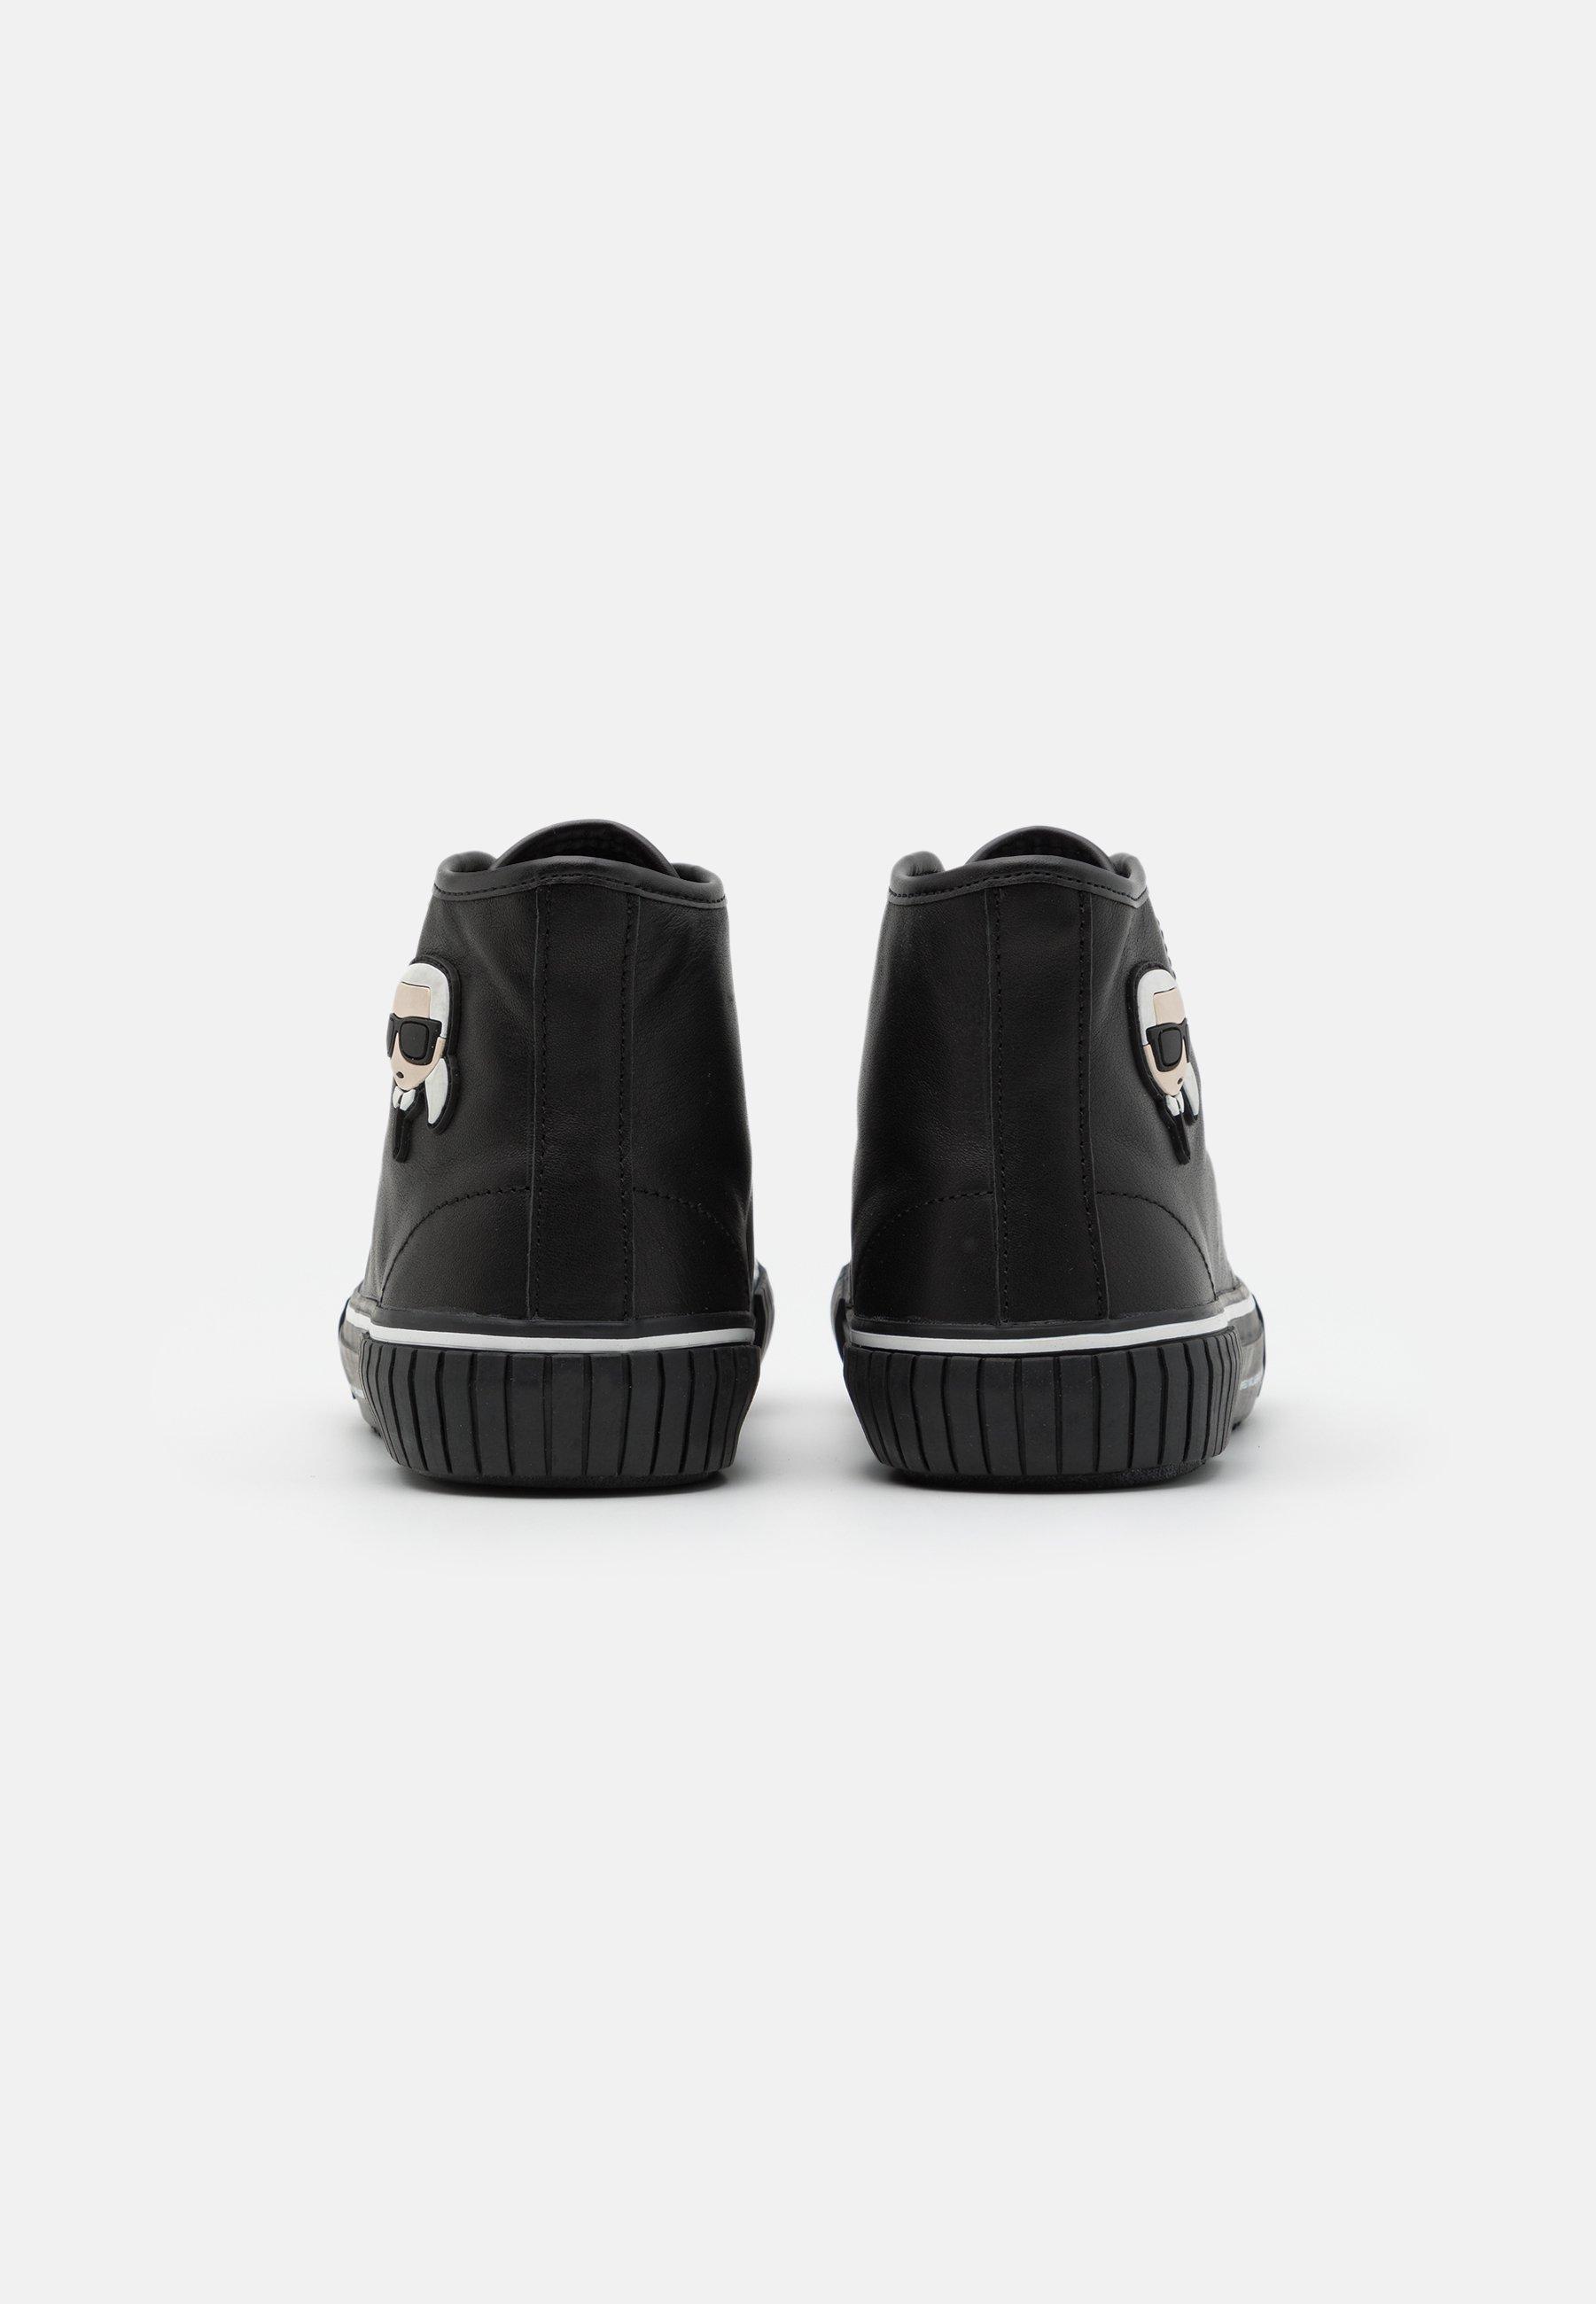 KARL LAGERFELD KAMPUS II KARL 3D IKON - Sneaker high - black/schwarz - Herrenschuhe 4ZbJJ